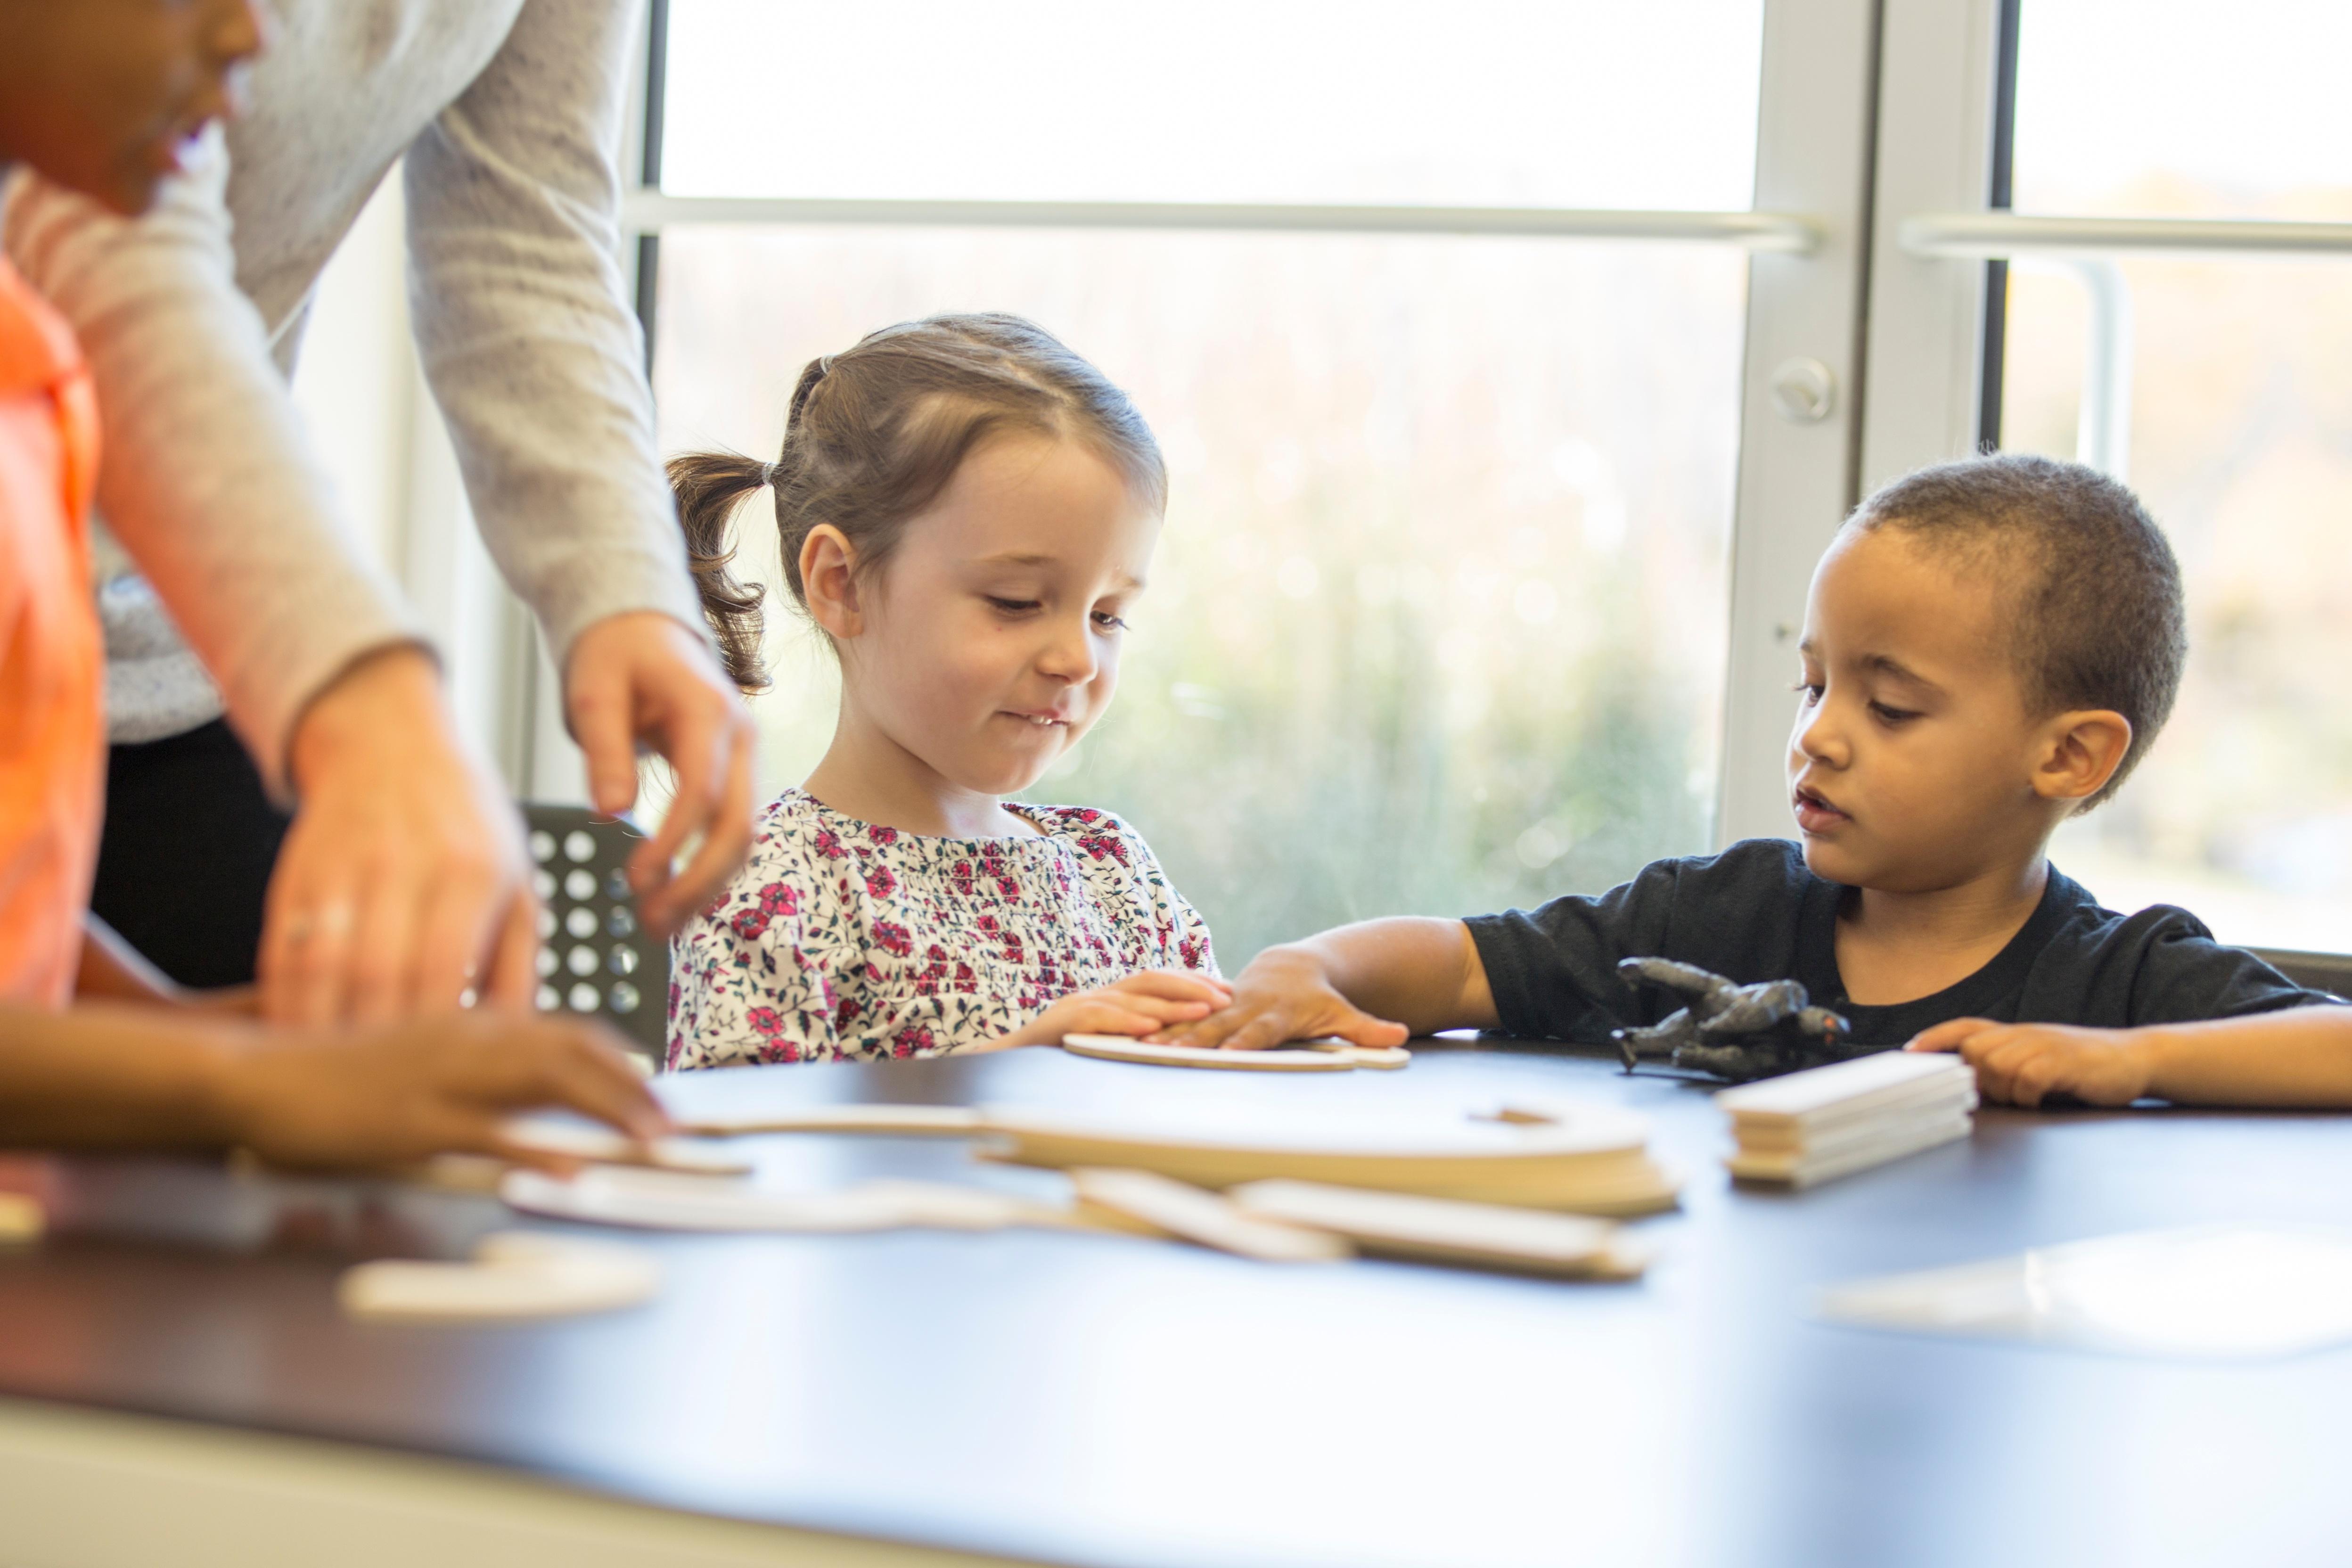 halifax learning reading program reading support tutor tutoring read write spell education literacy